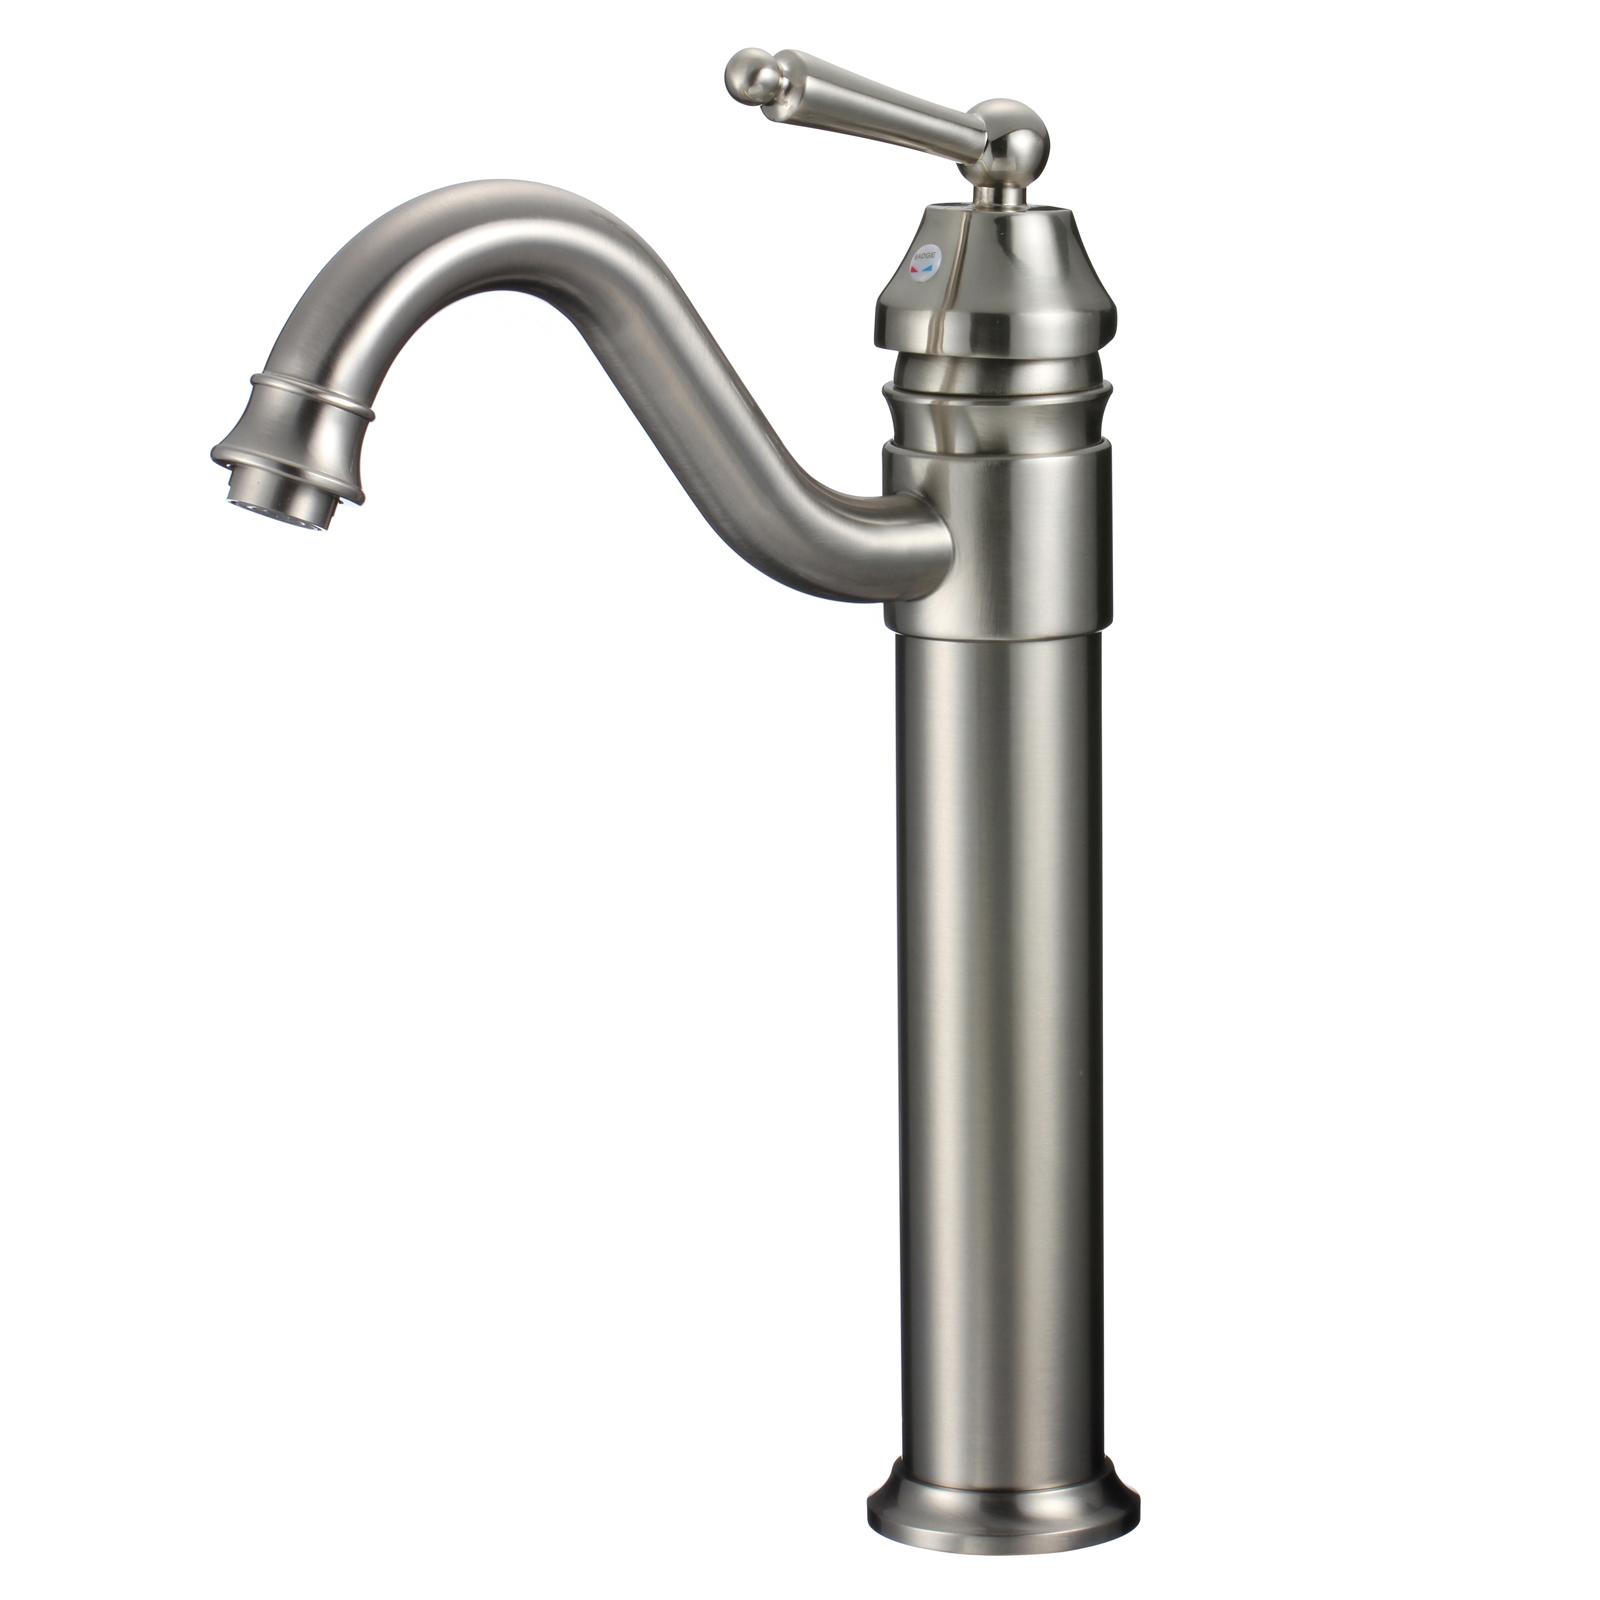 "14"" Kitchen / Bar / Bathroom Vessel Sink Faucet"